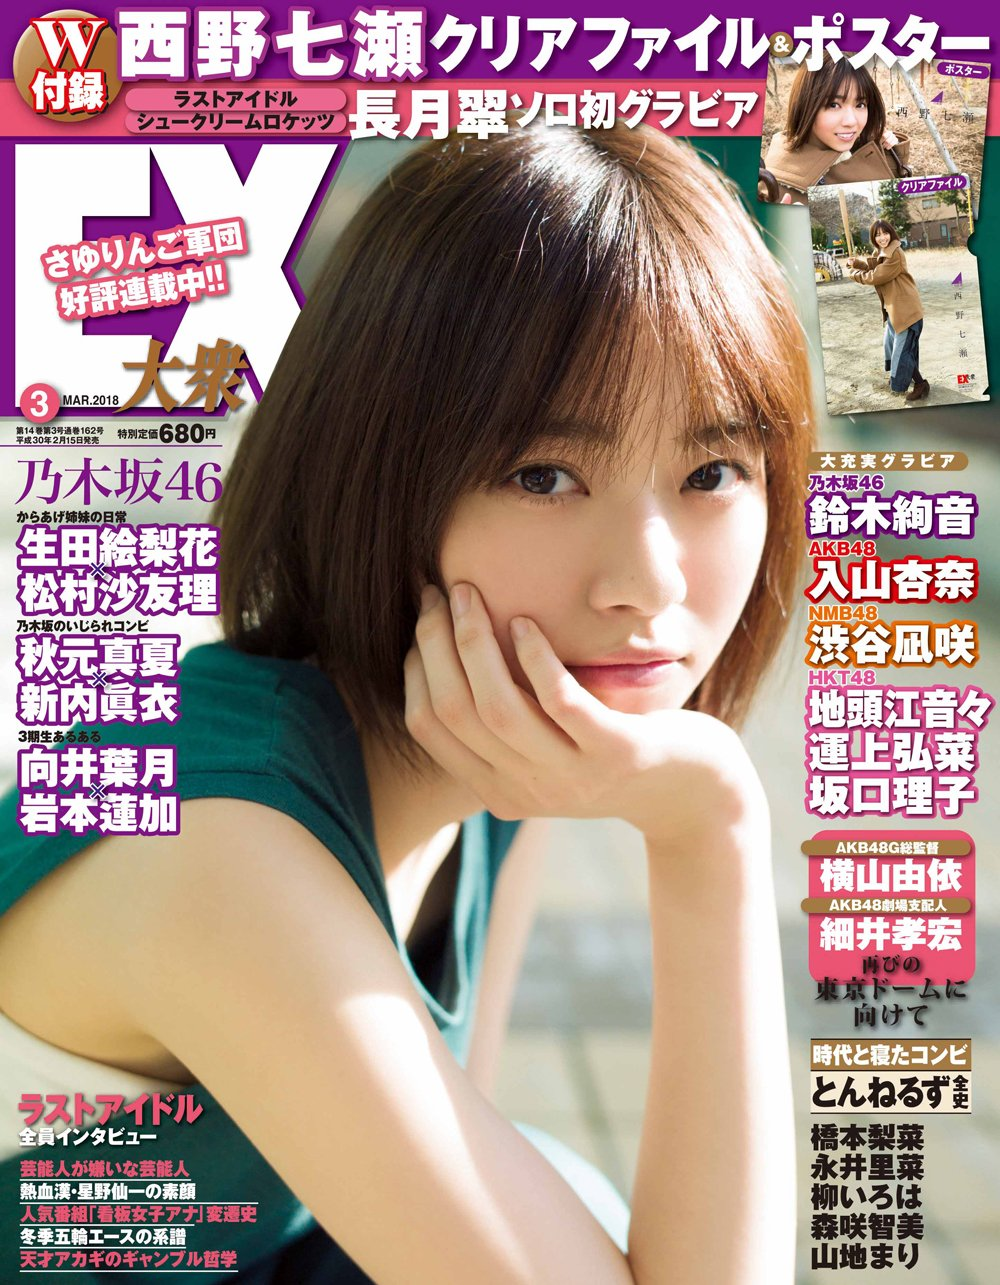 EX (イーエックス) 大衆 2018年3月号 西野七瀬